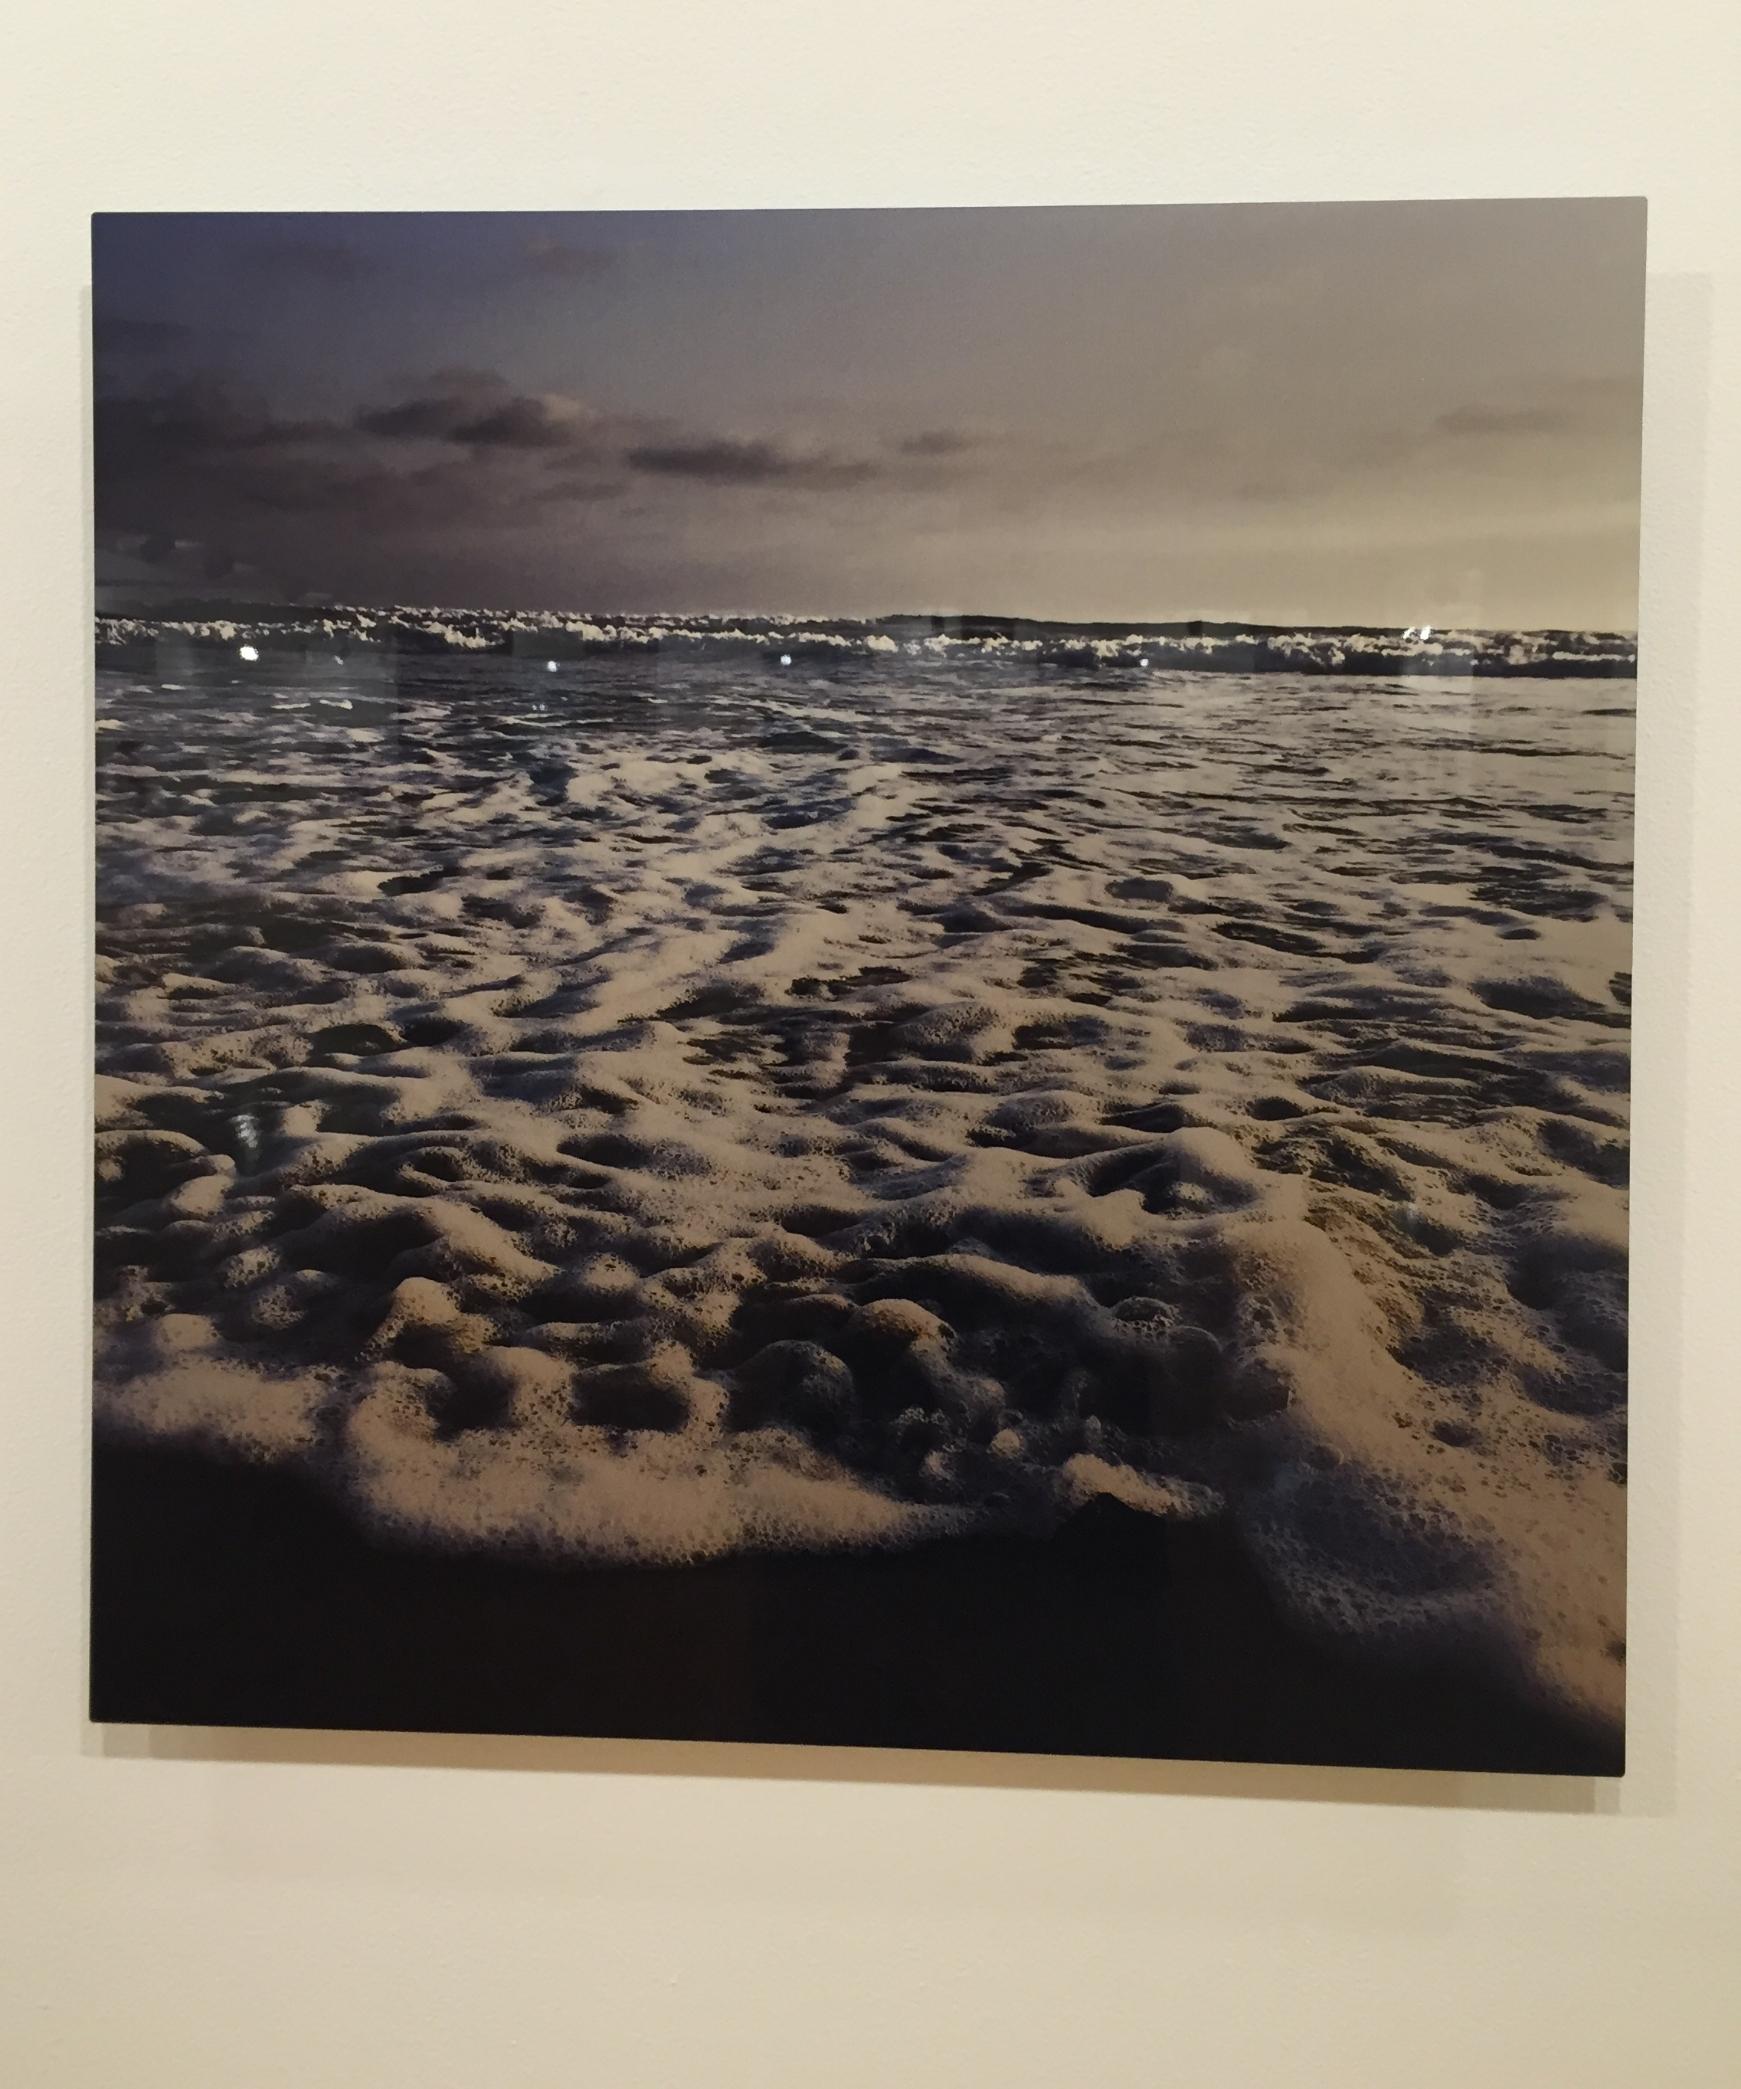 8. Exhale, Anushe Shoro, 24 x 24 inches, $350